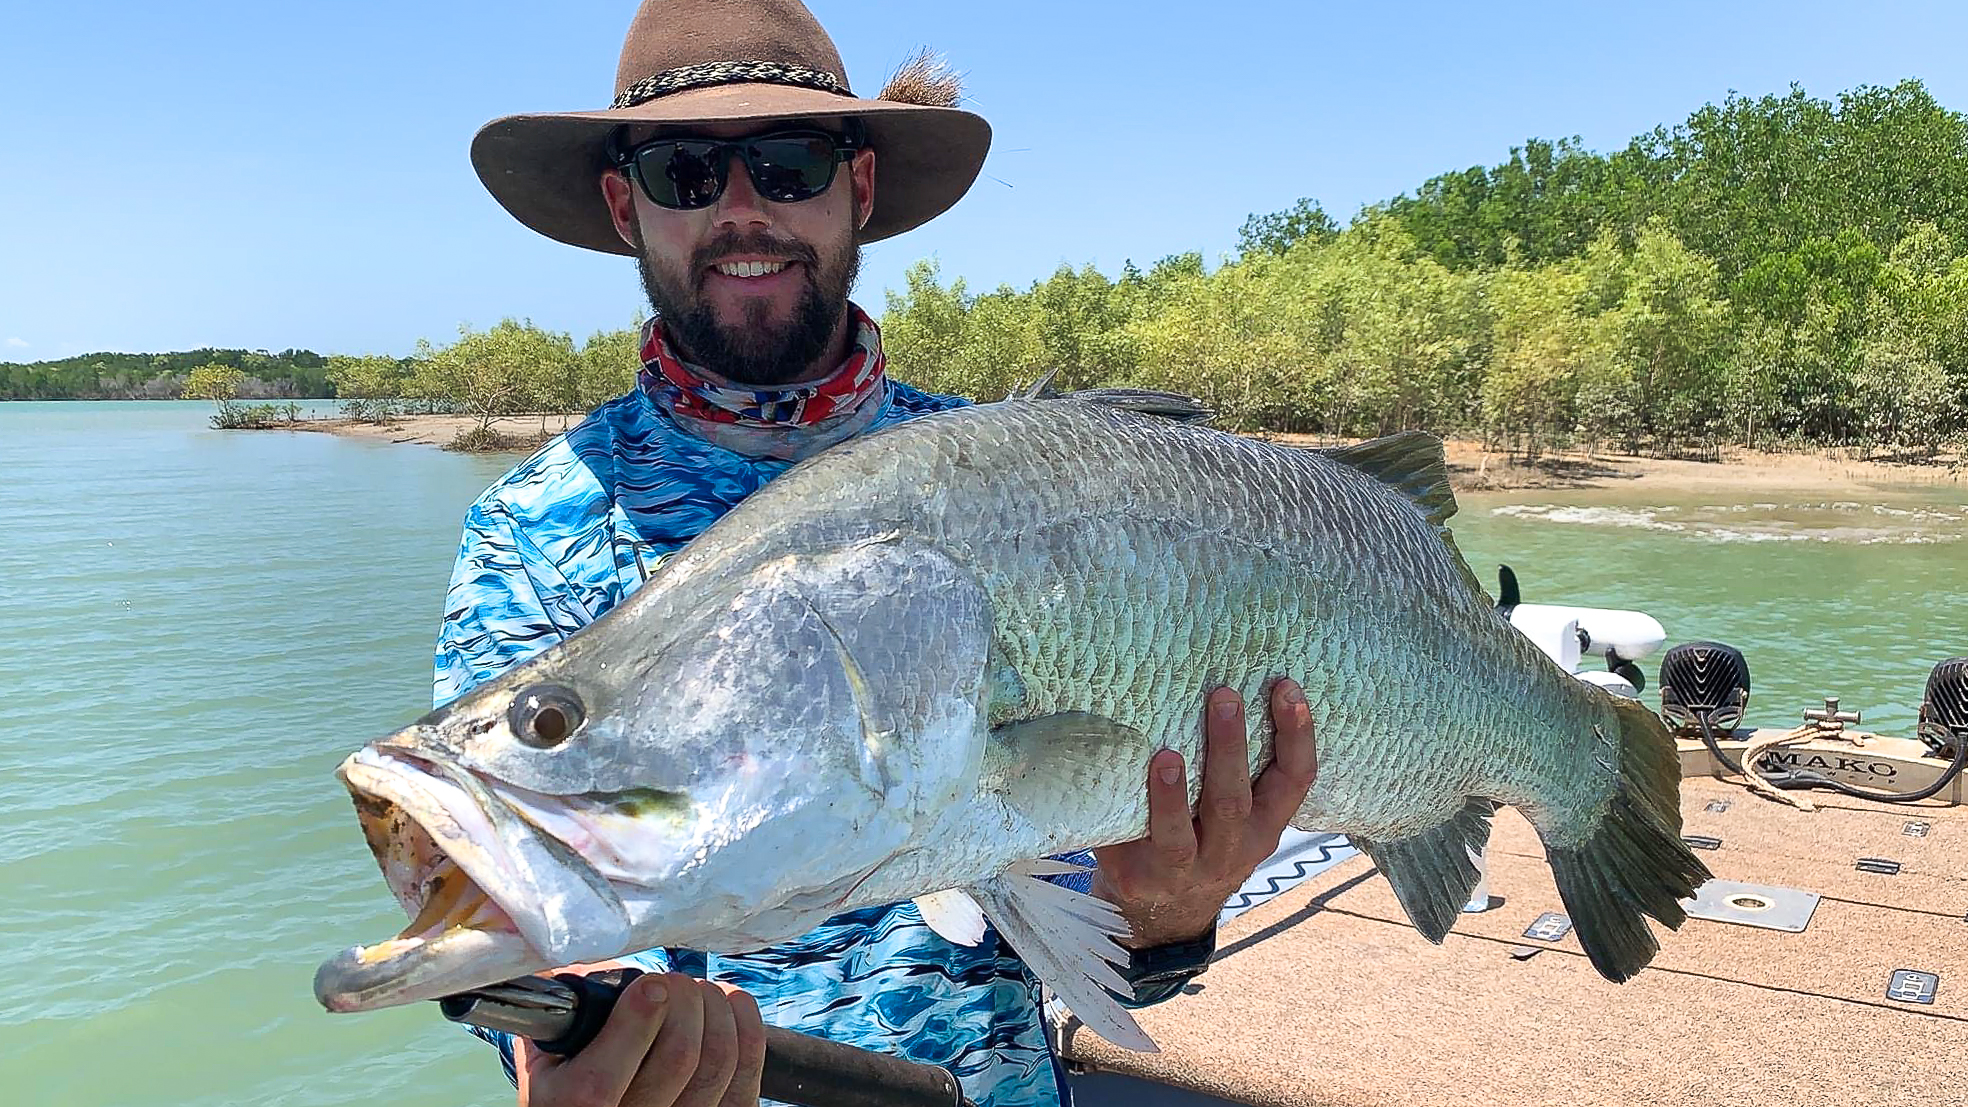 AUSTRALIAN FLY FISHING SPECIALS